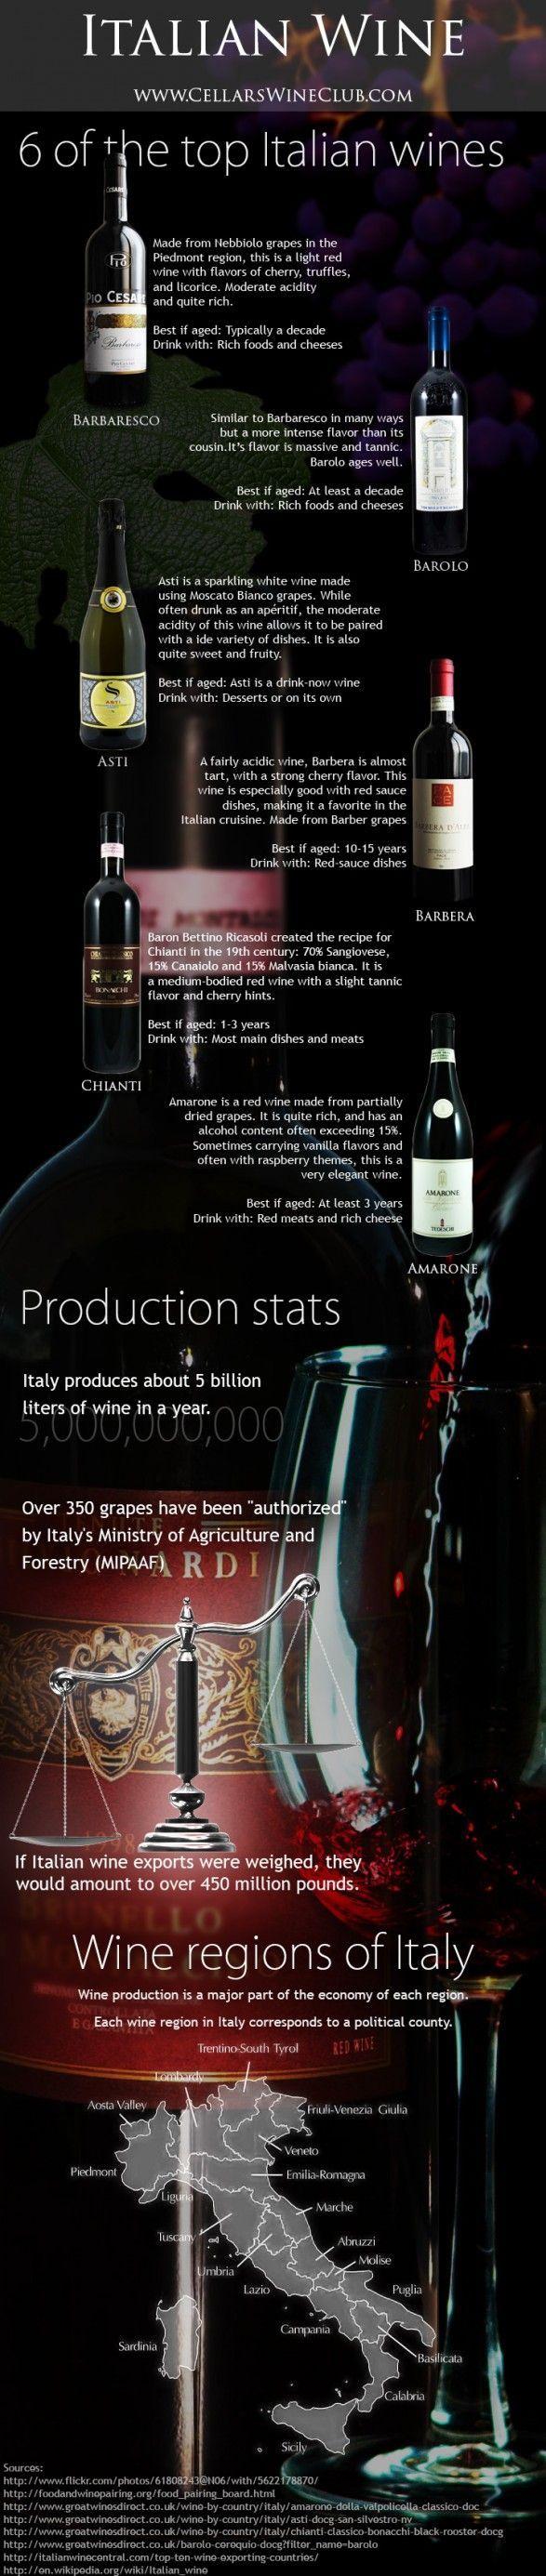 Wine | Tipsographic | More wine tips at http://www.tipsographic.com/?utm_content=buffer9650b&utm_medium=social&utm_source=pinterest.com&utm_campaign=buffer